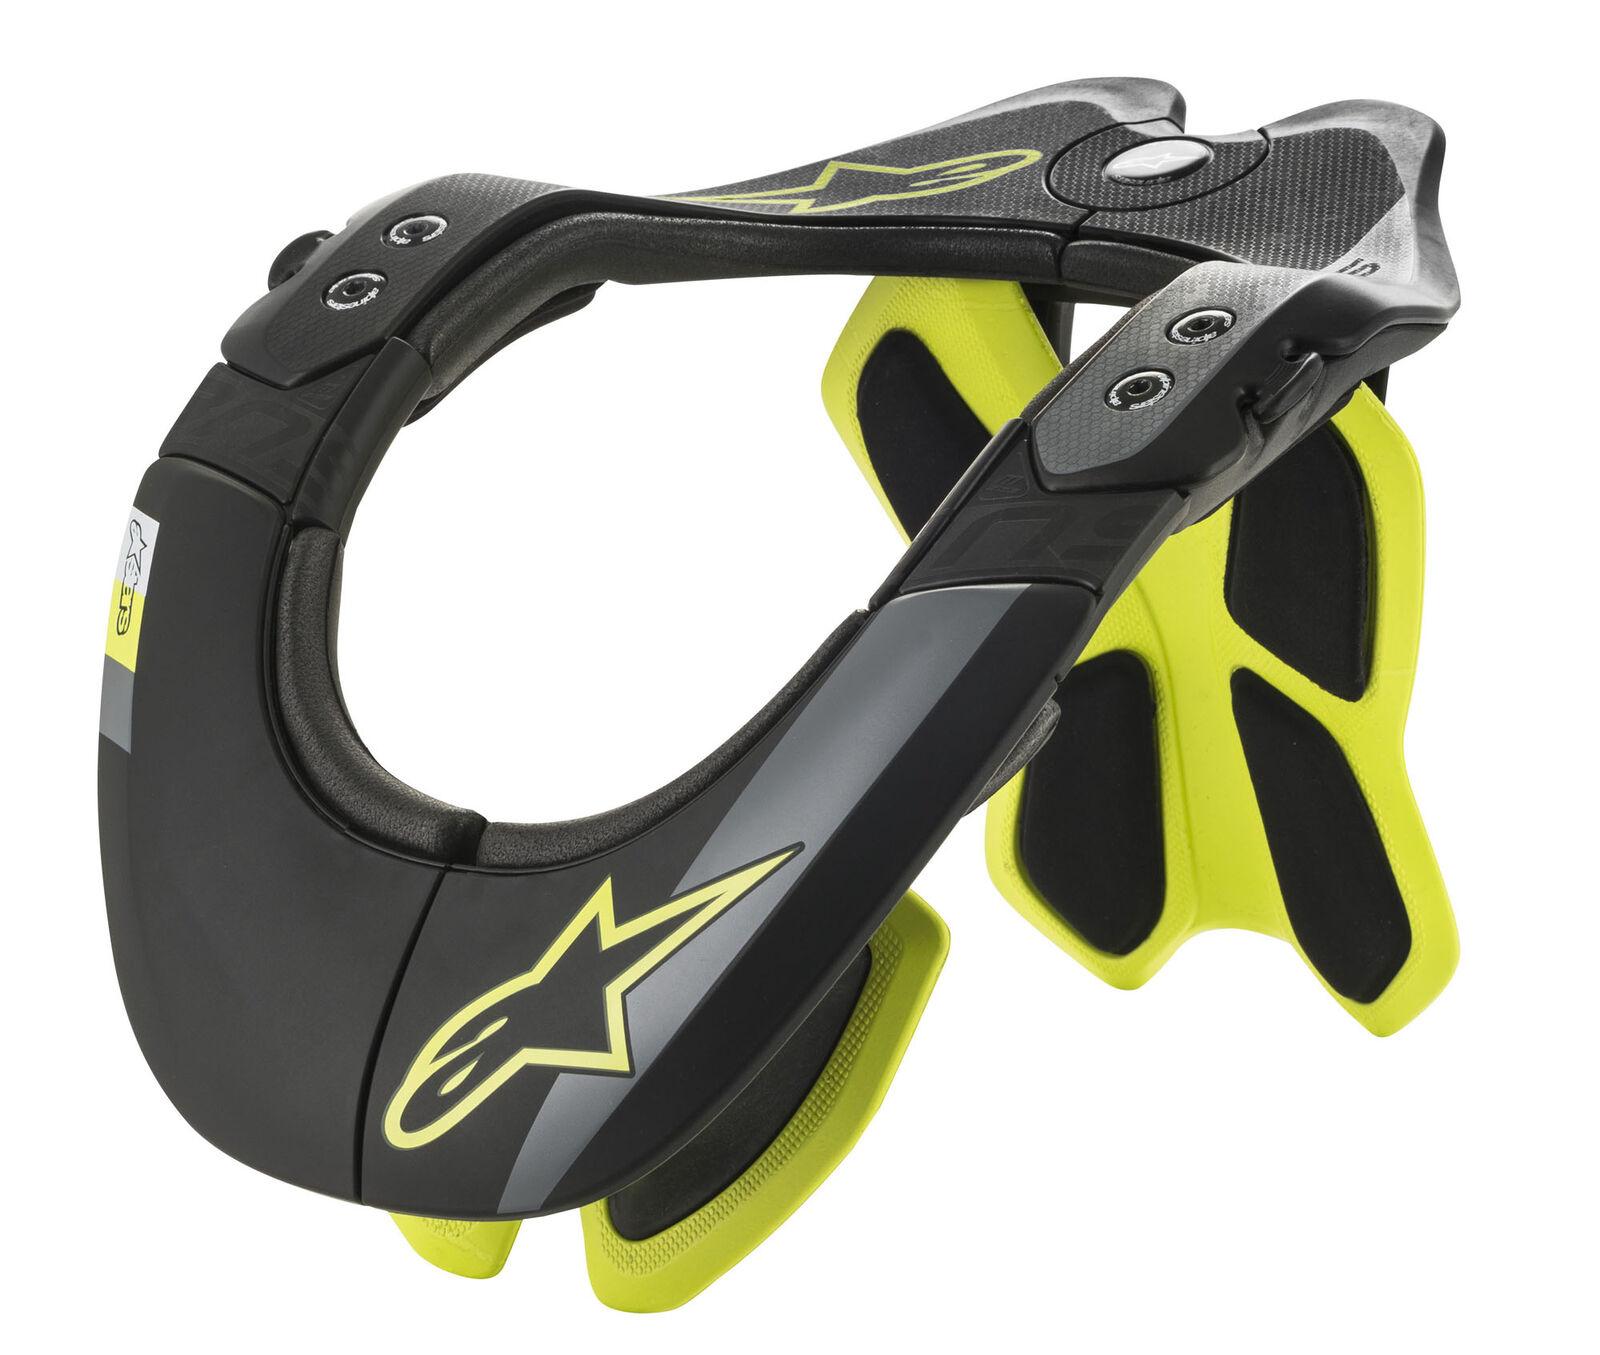 6500019 Alpinestars BNS TECH-2 MTB Mountain Biking Cycling Predection